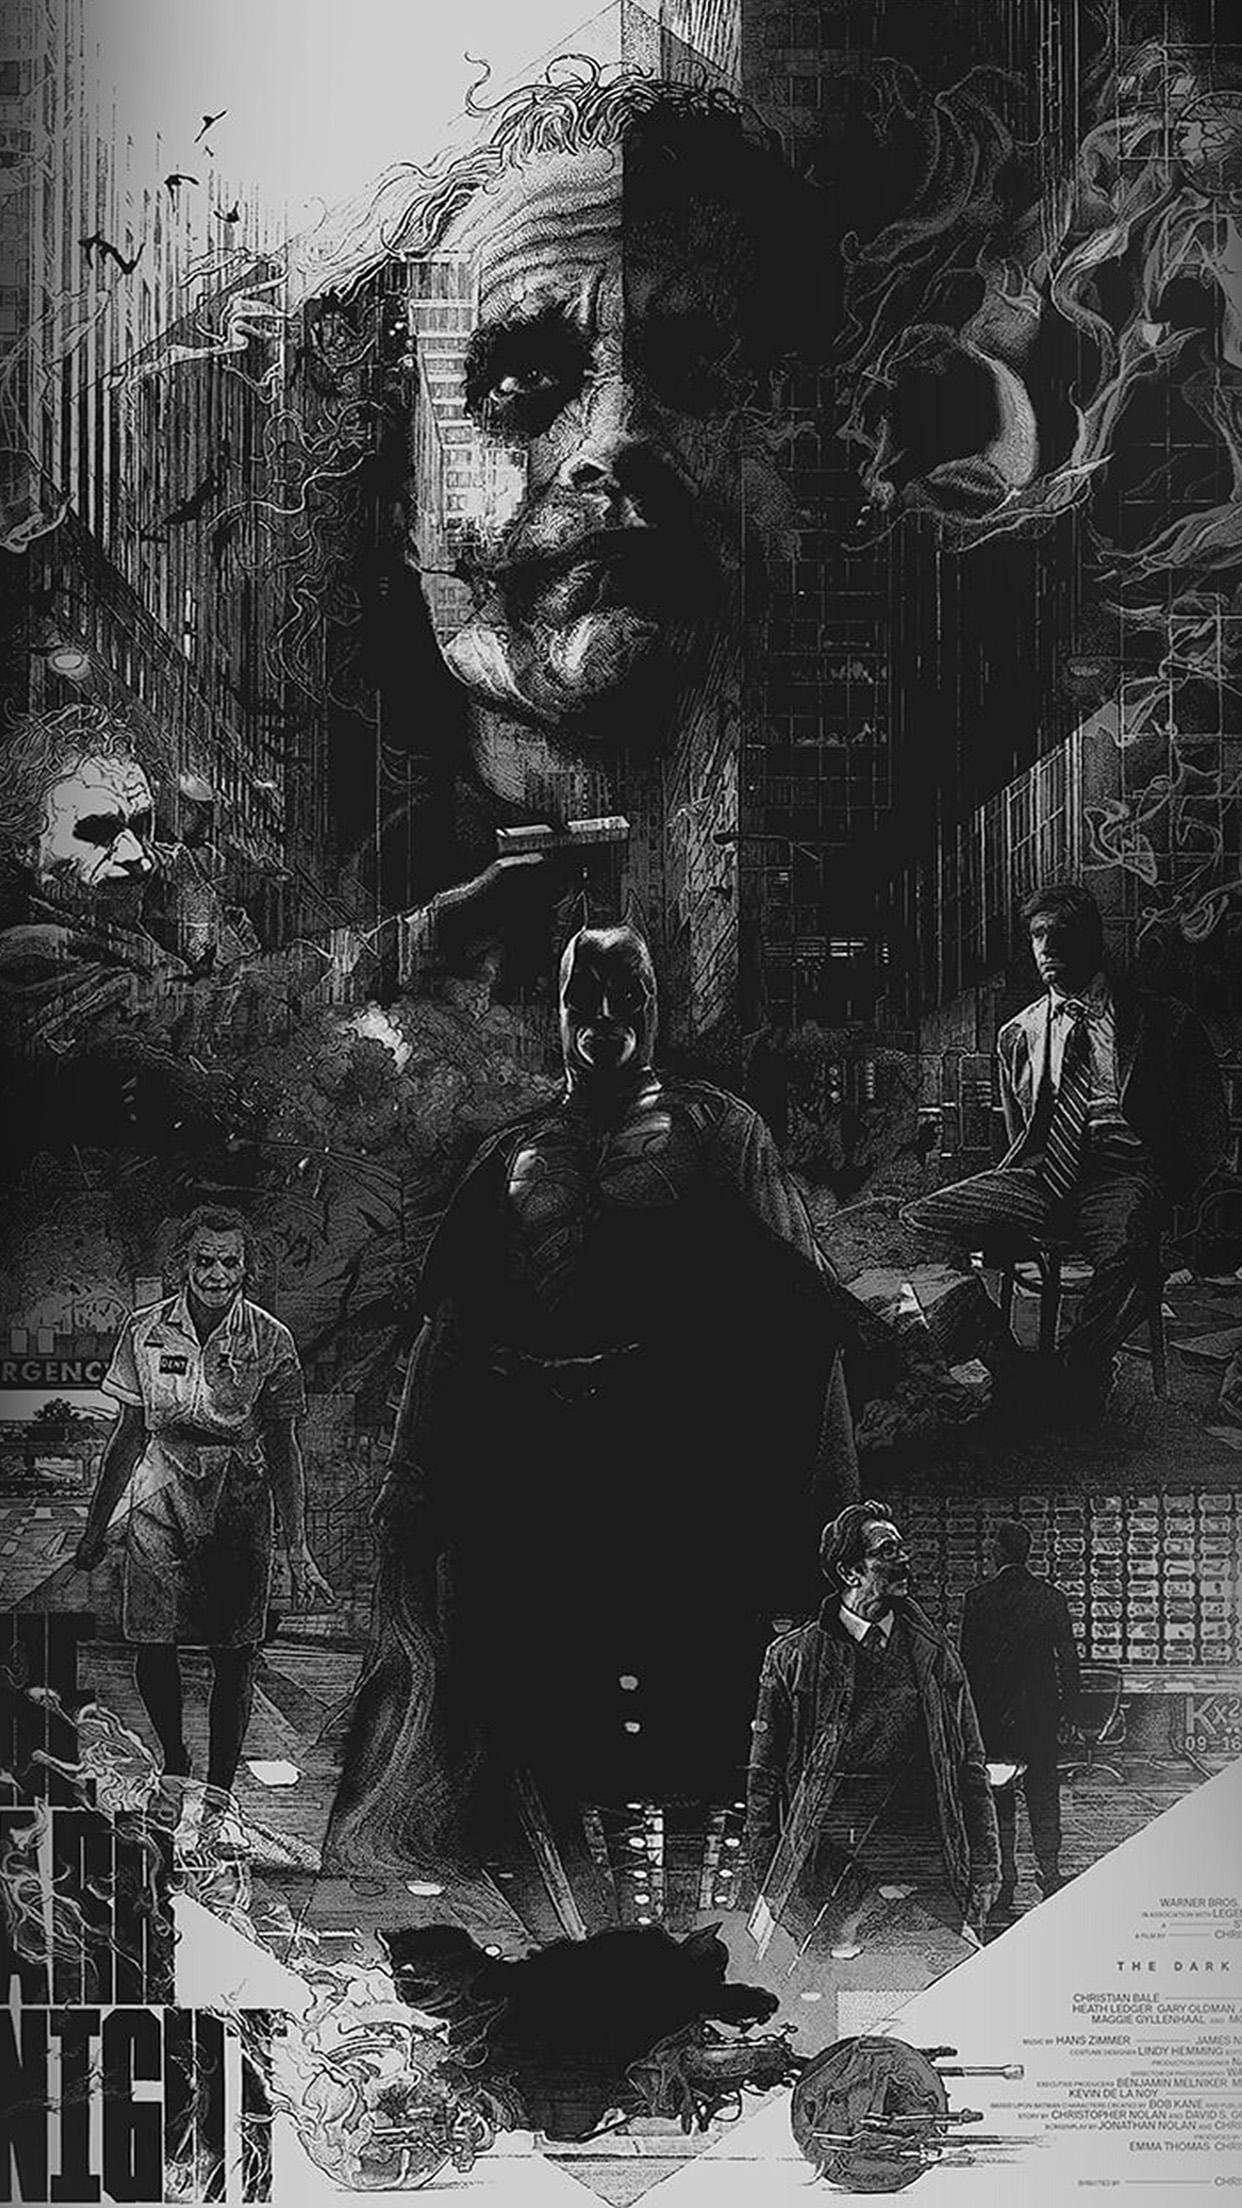 Az95 Joker Batman Poster Film Hero Illustration Art Wallpaper